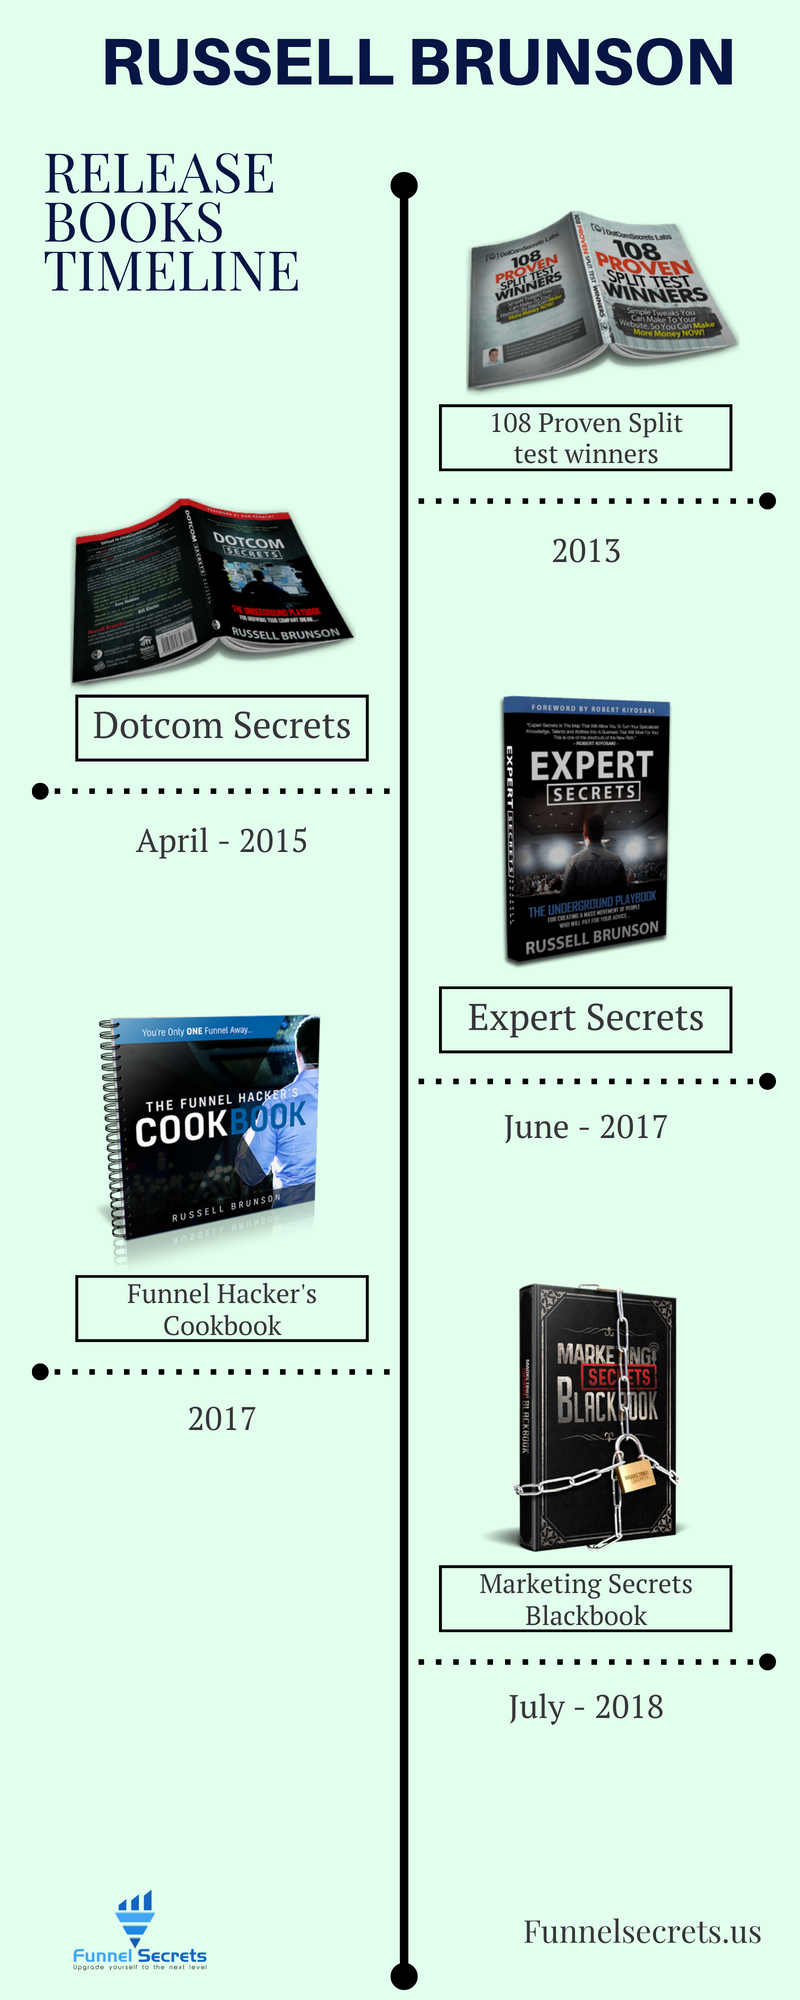 Russell Brunson books timeline